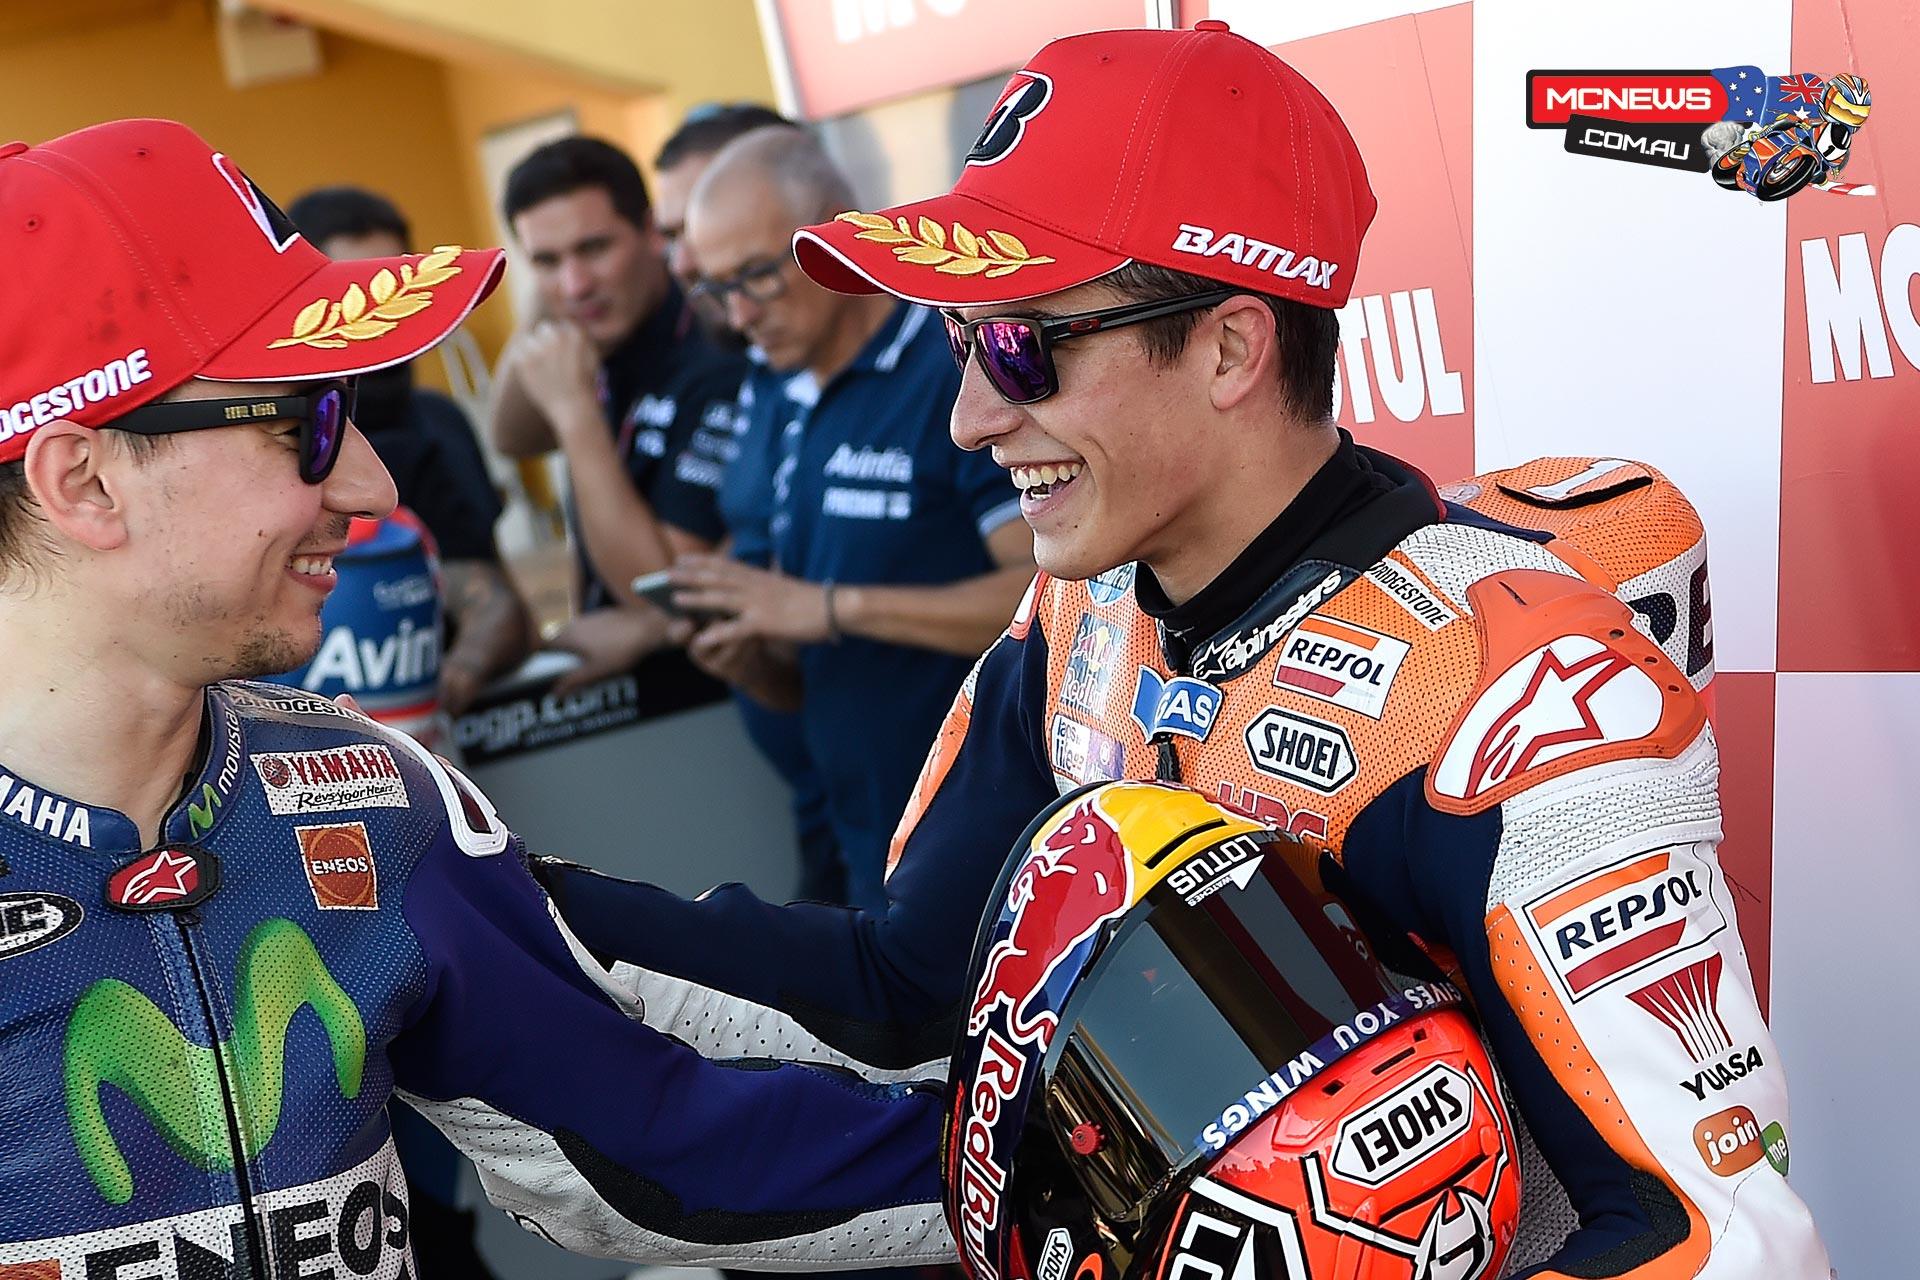 Marc Marquez and Jorge Lorenzo